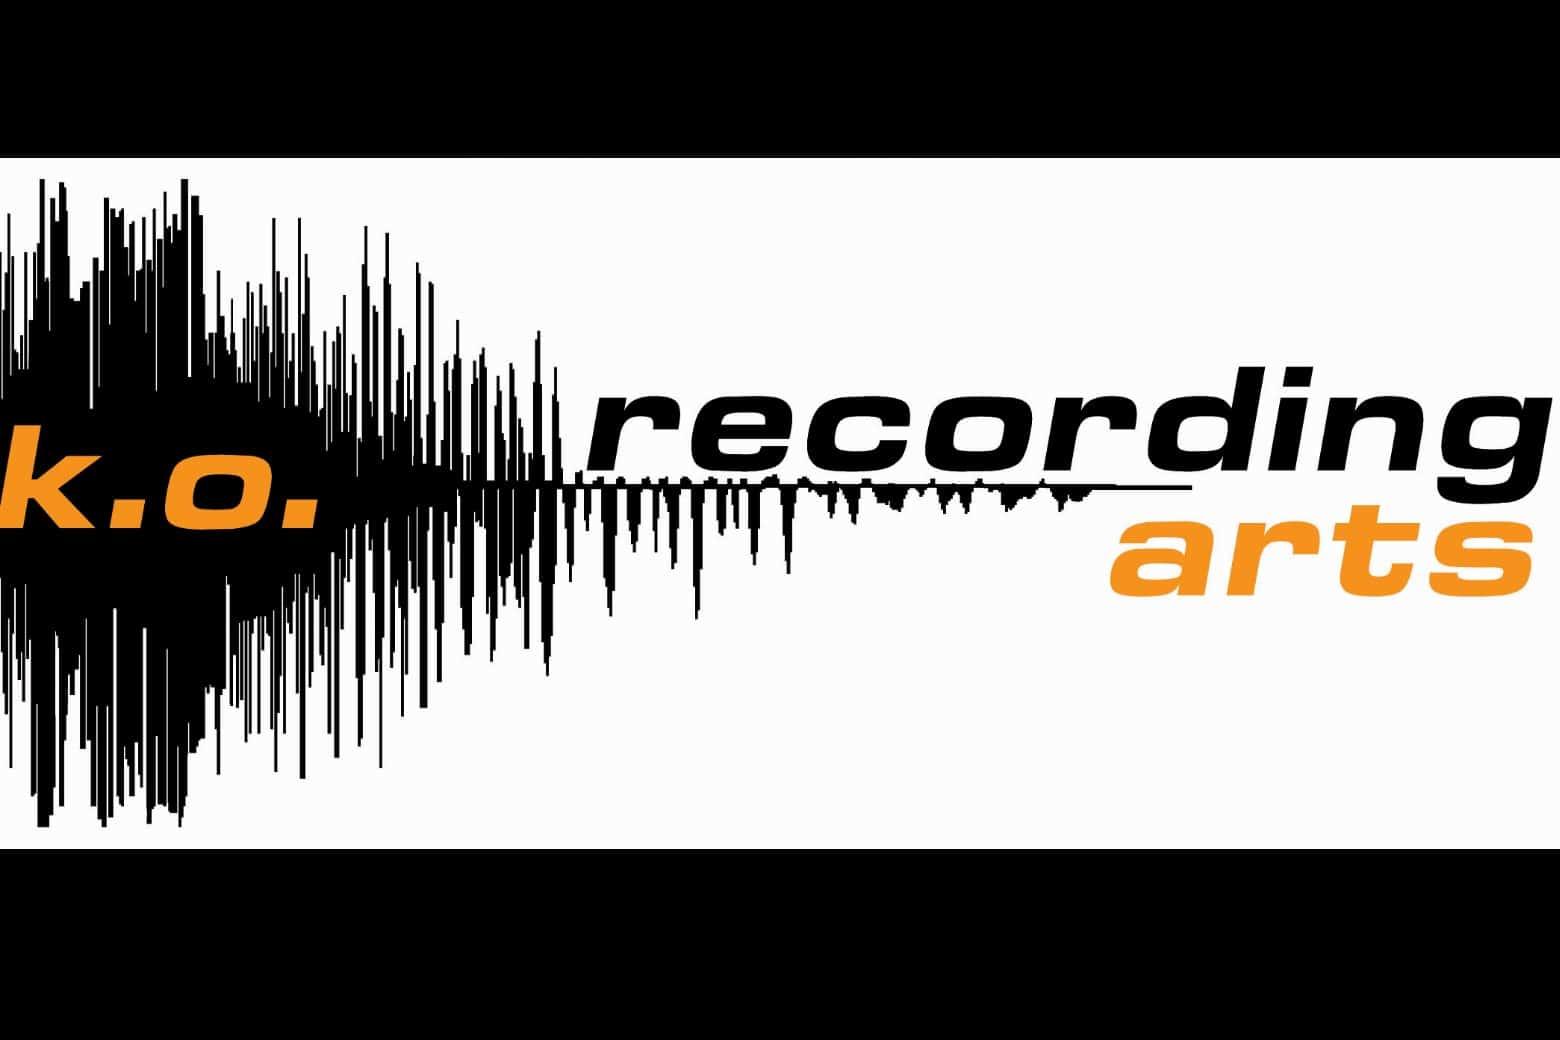 k.o.-recording-arts Logo